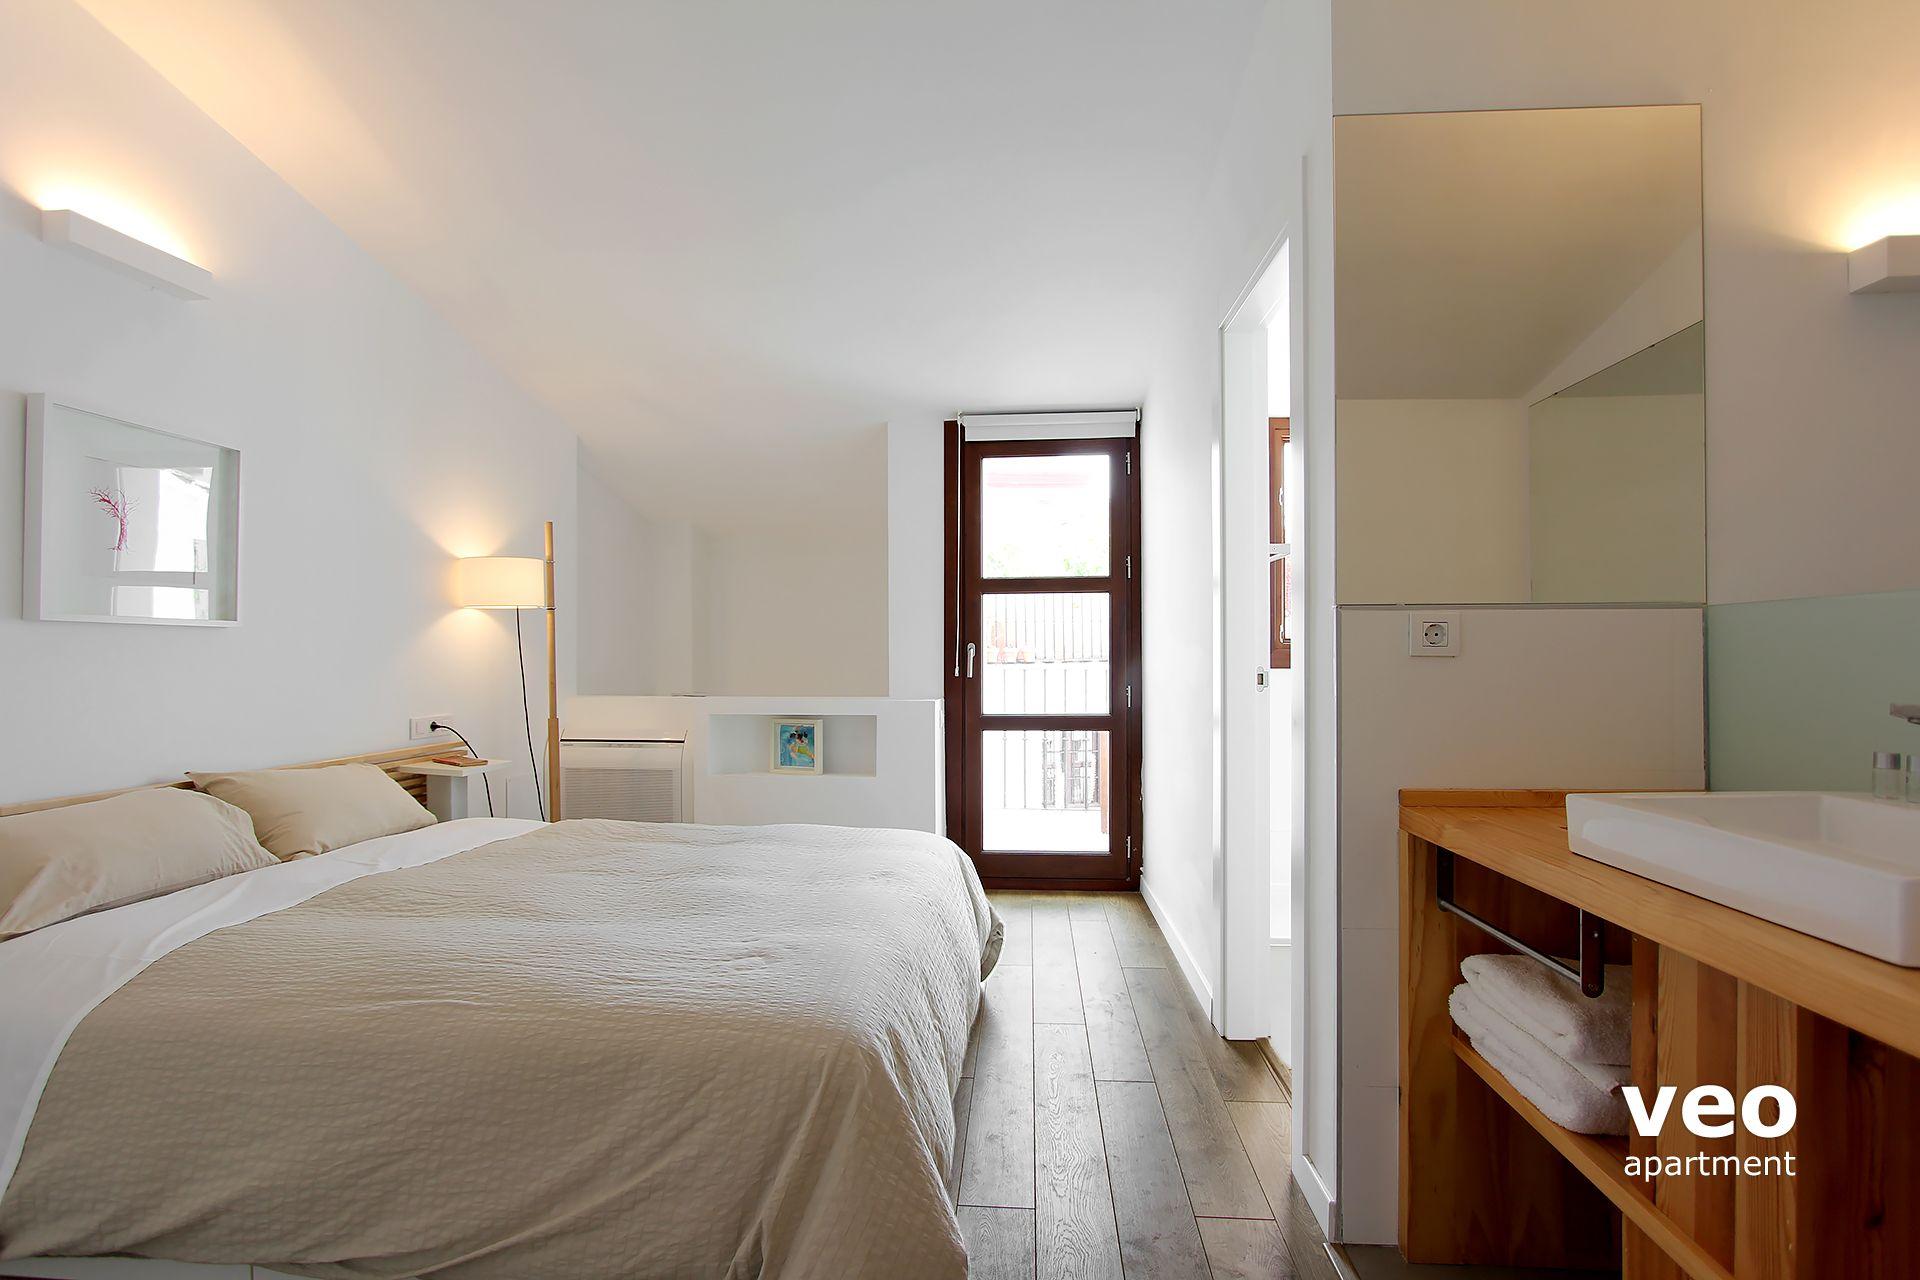 2 bedroom apartment san jose apartments in san jose sagemark